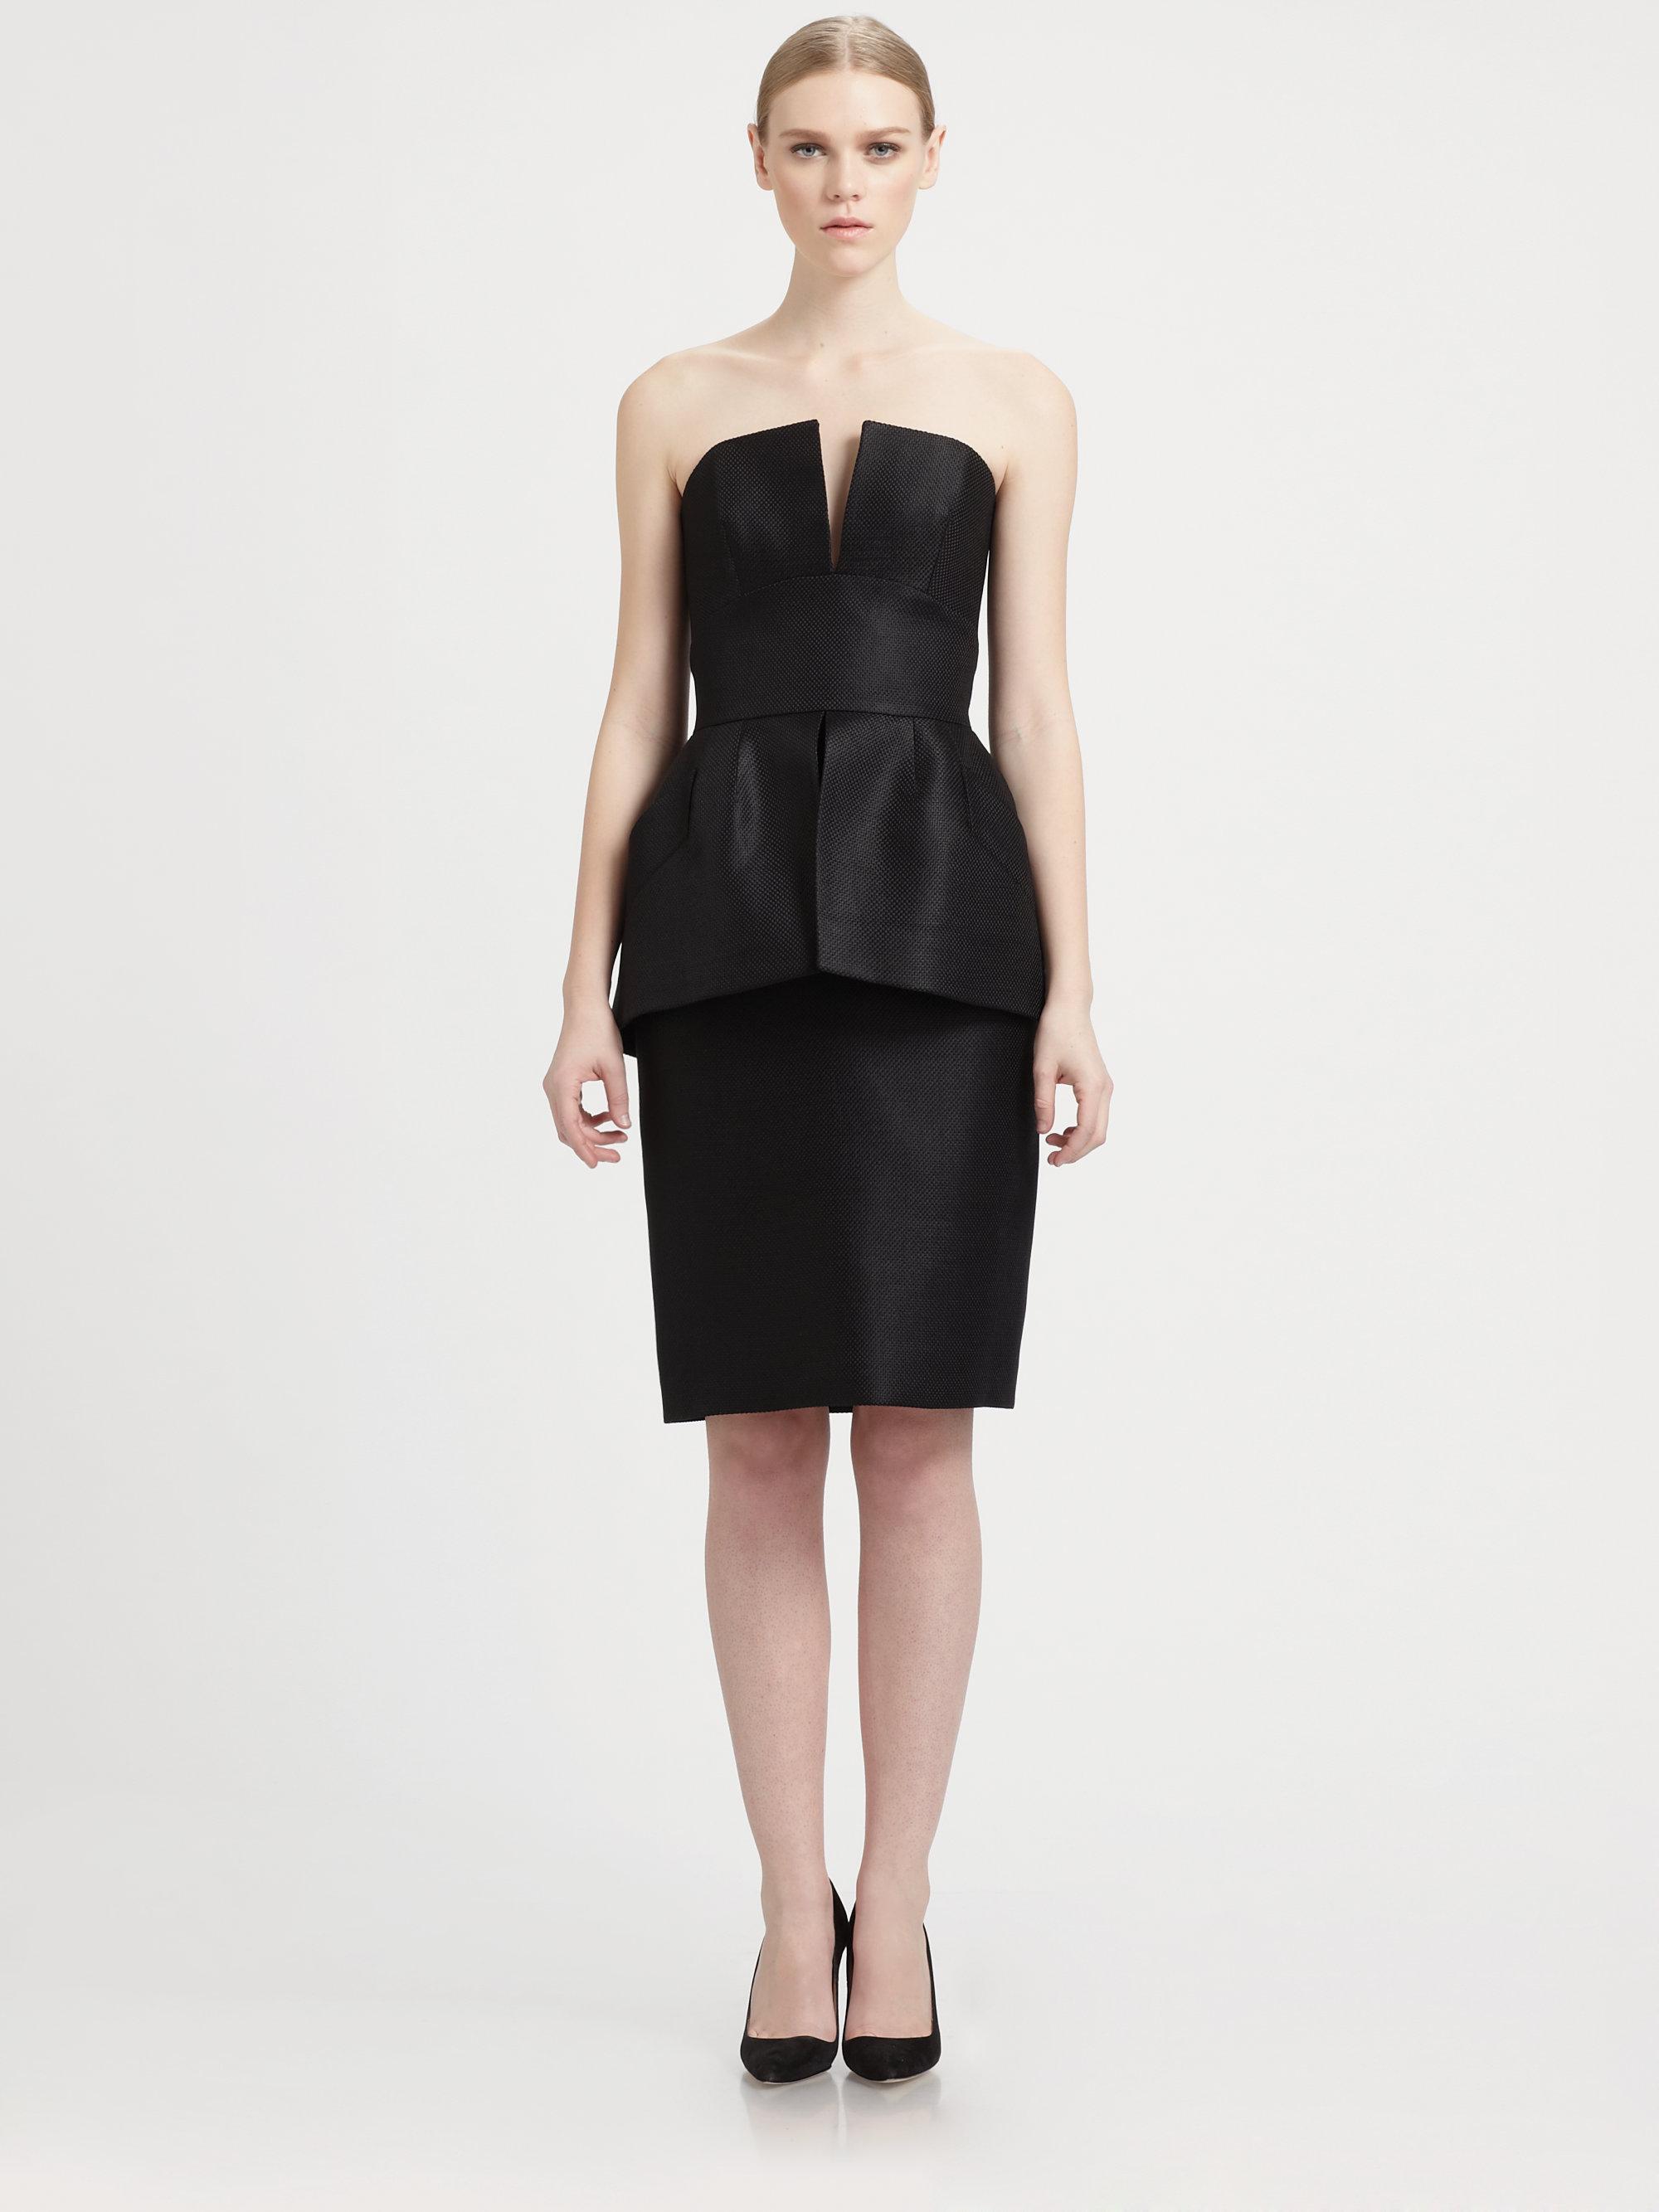 b008711607 Lyst - Martin Grant Strapless Peplum Dress in Black